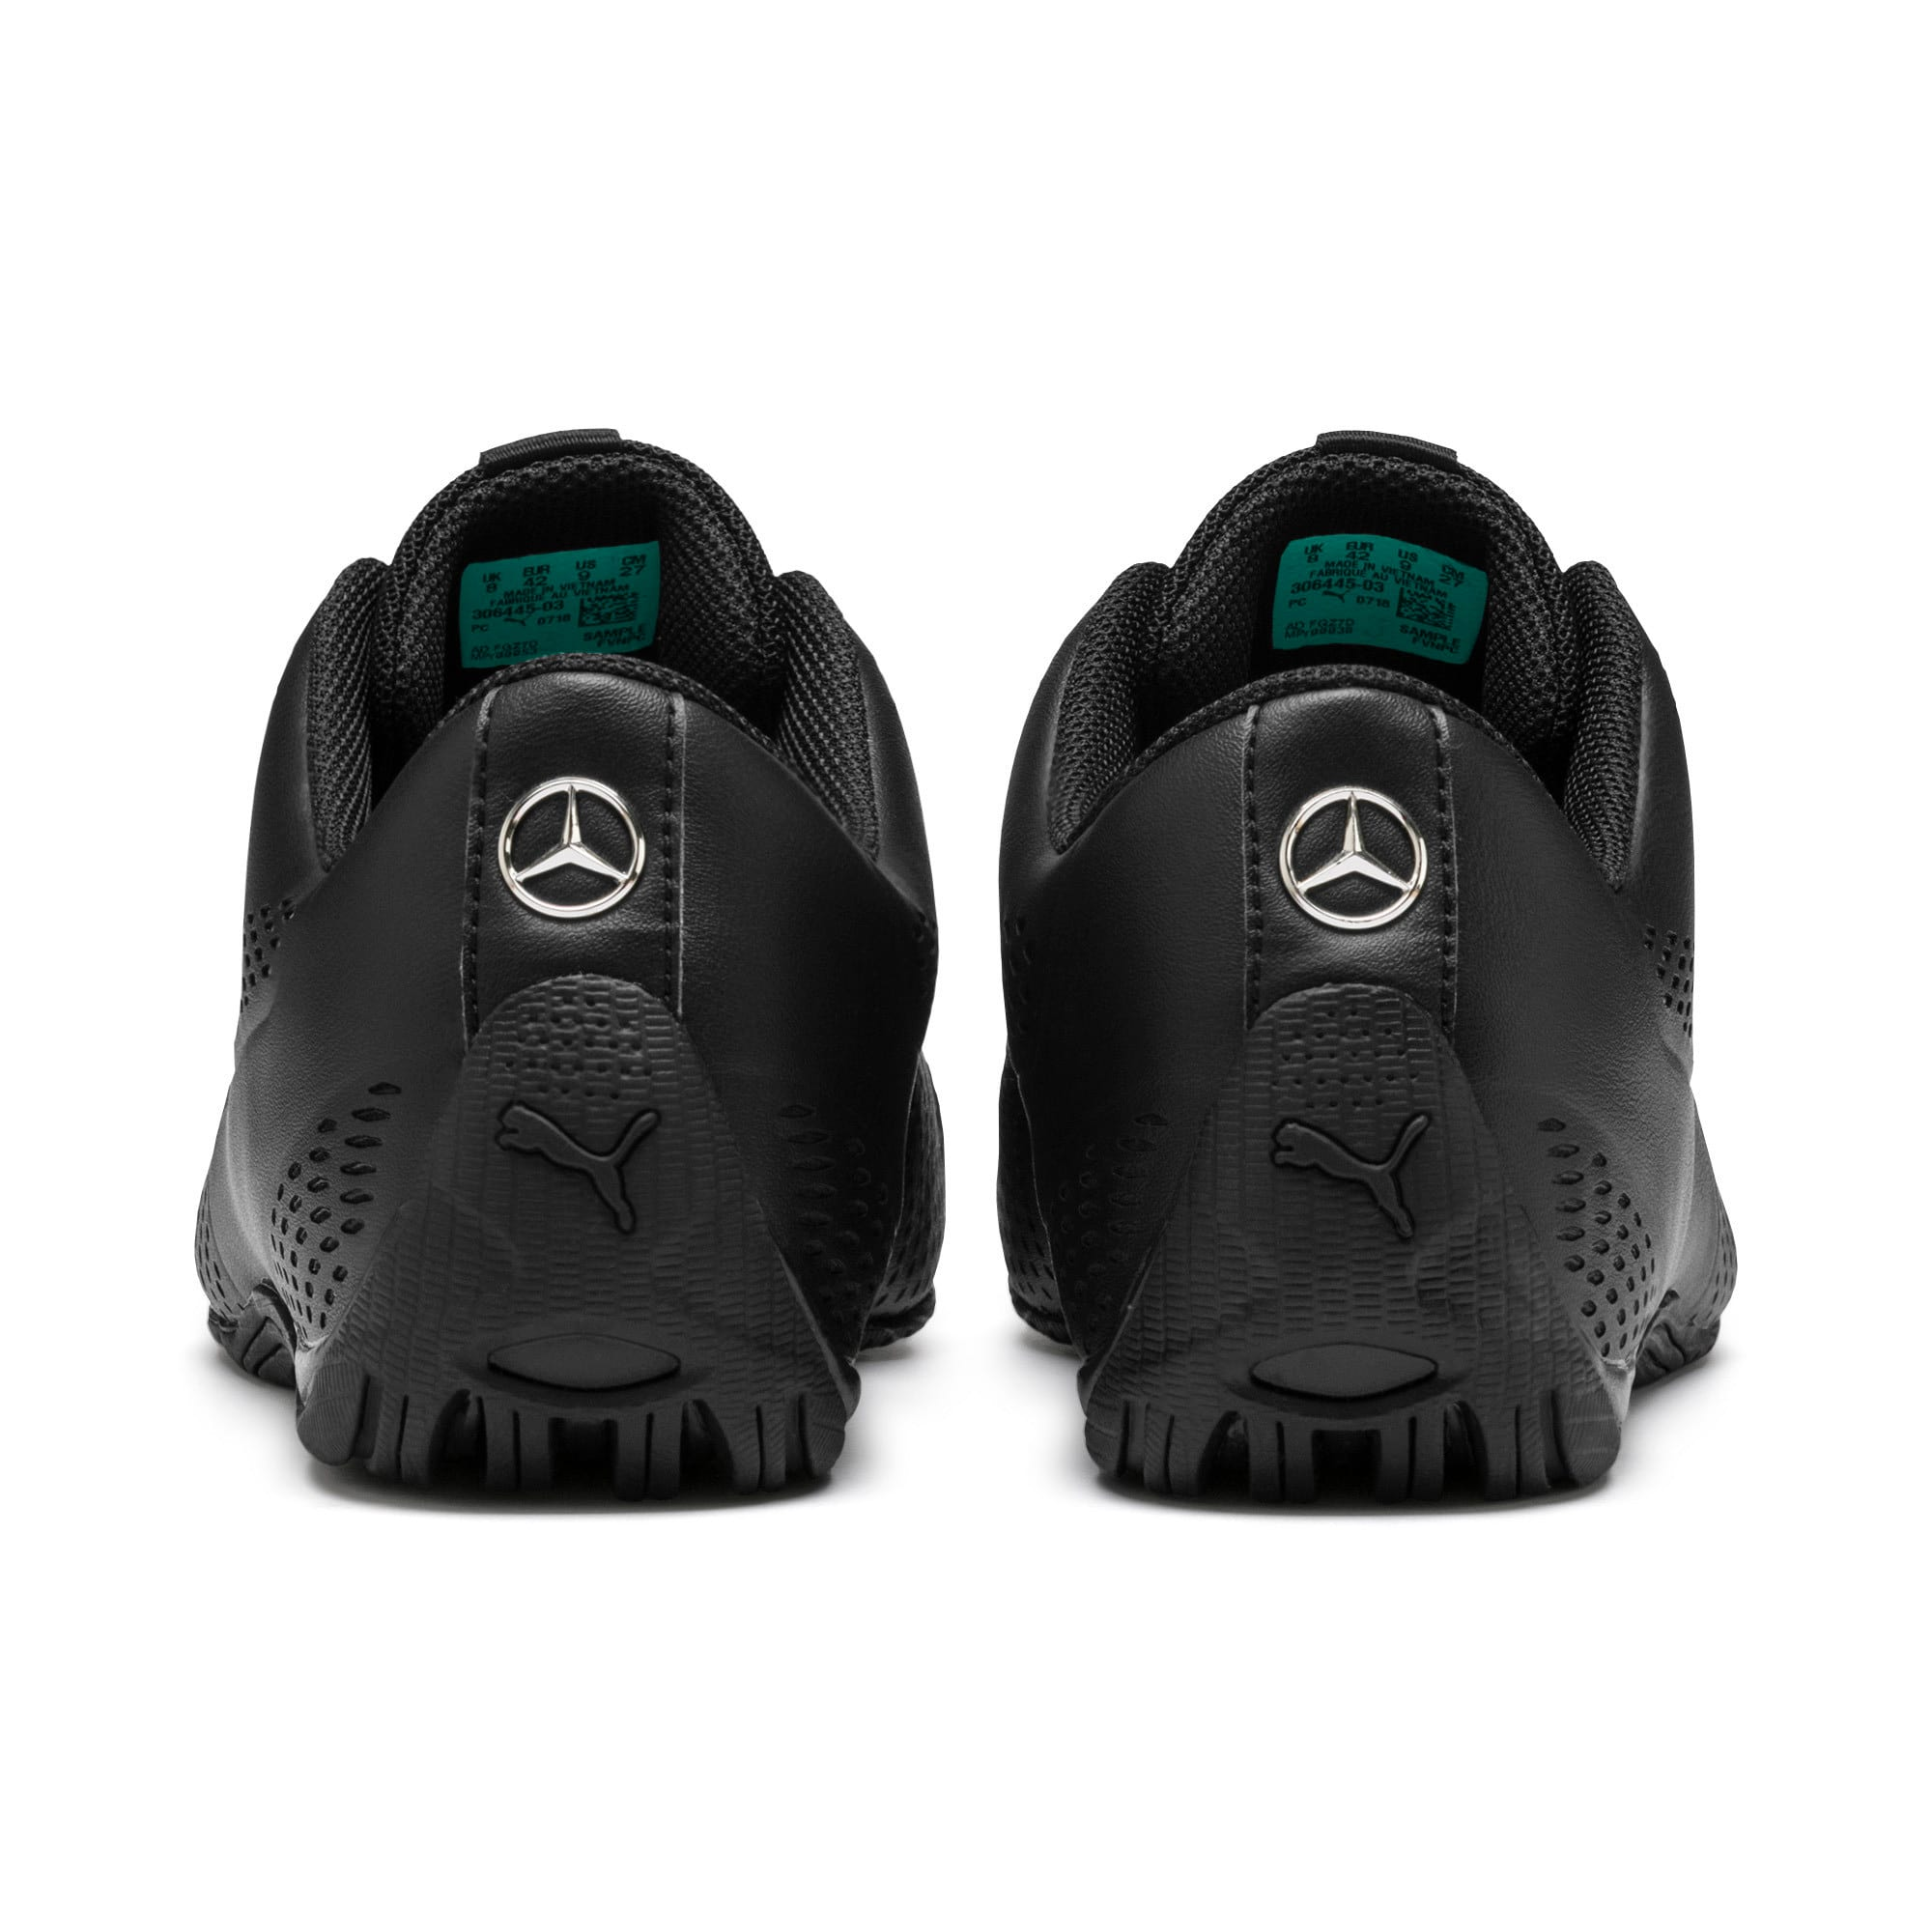 Thumbnail 4 of Mercedes AMG Petronas Drift Cat 5 Ultra II Trainers, Puma Black-Spectra Green, medium